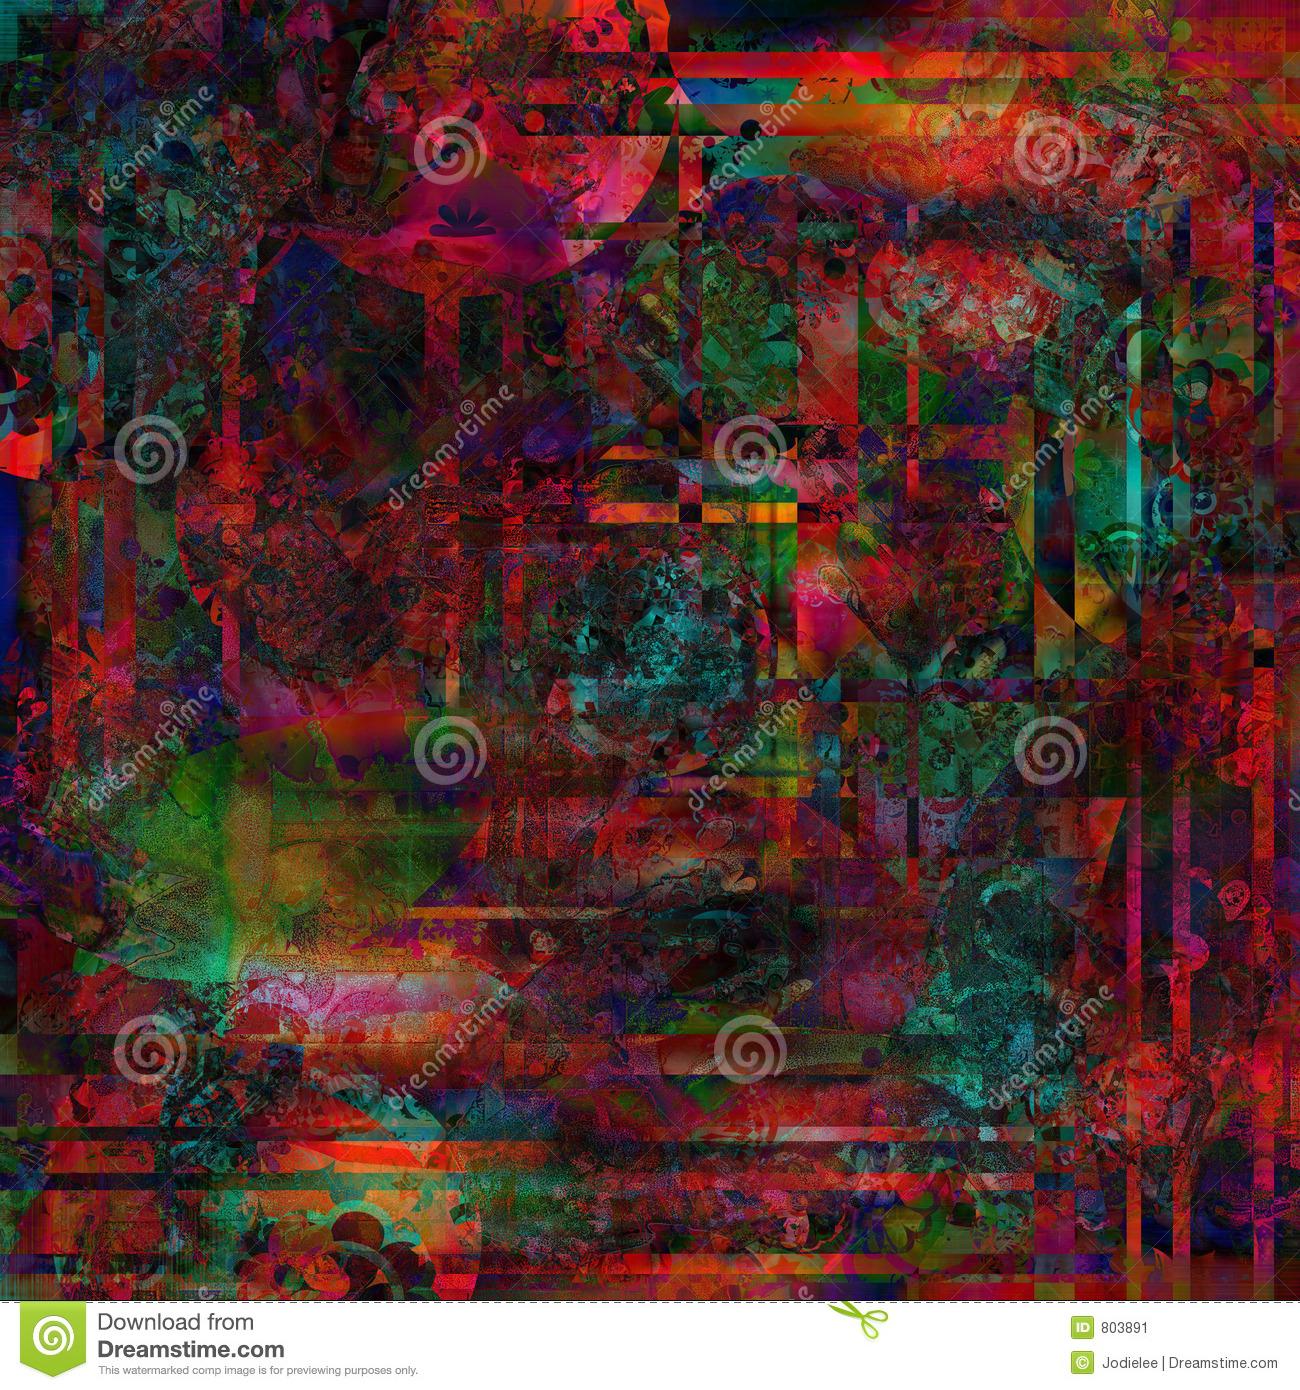 Bohemian Backgrounds Bohemian batik background 1300x1390